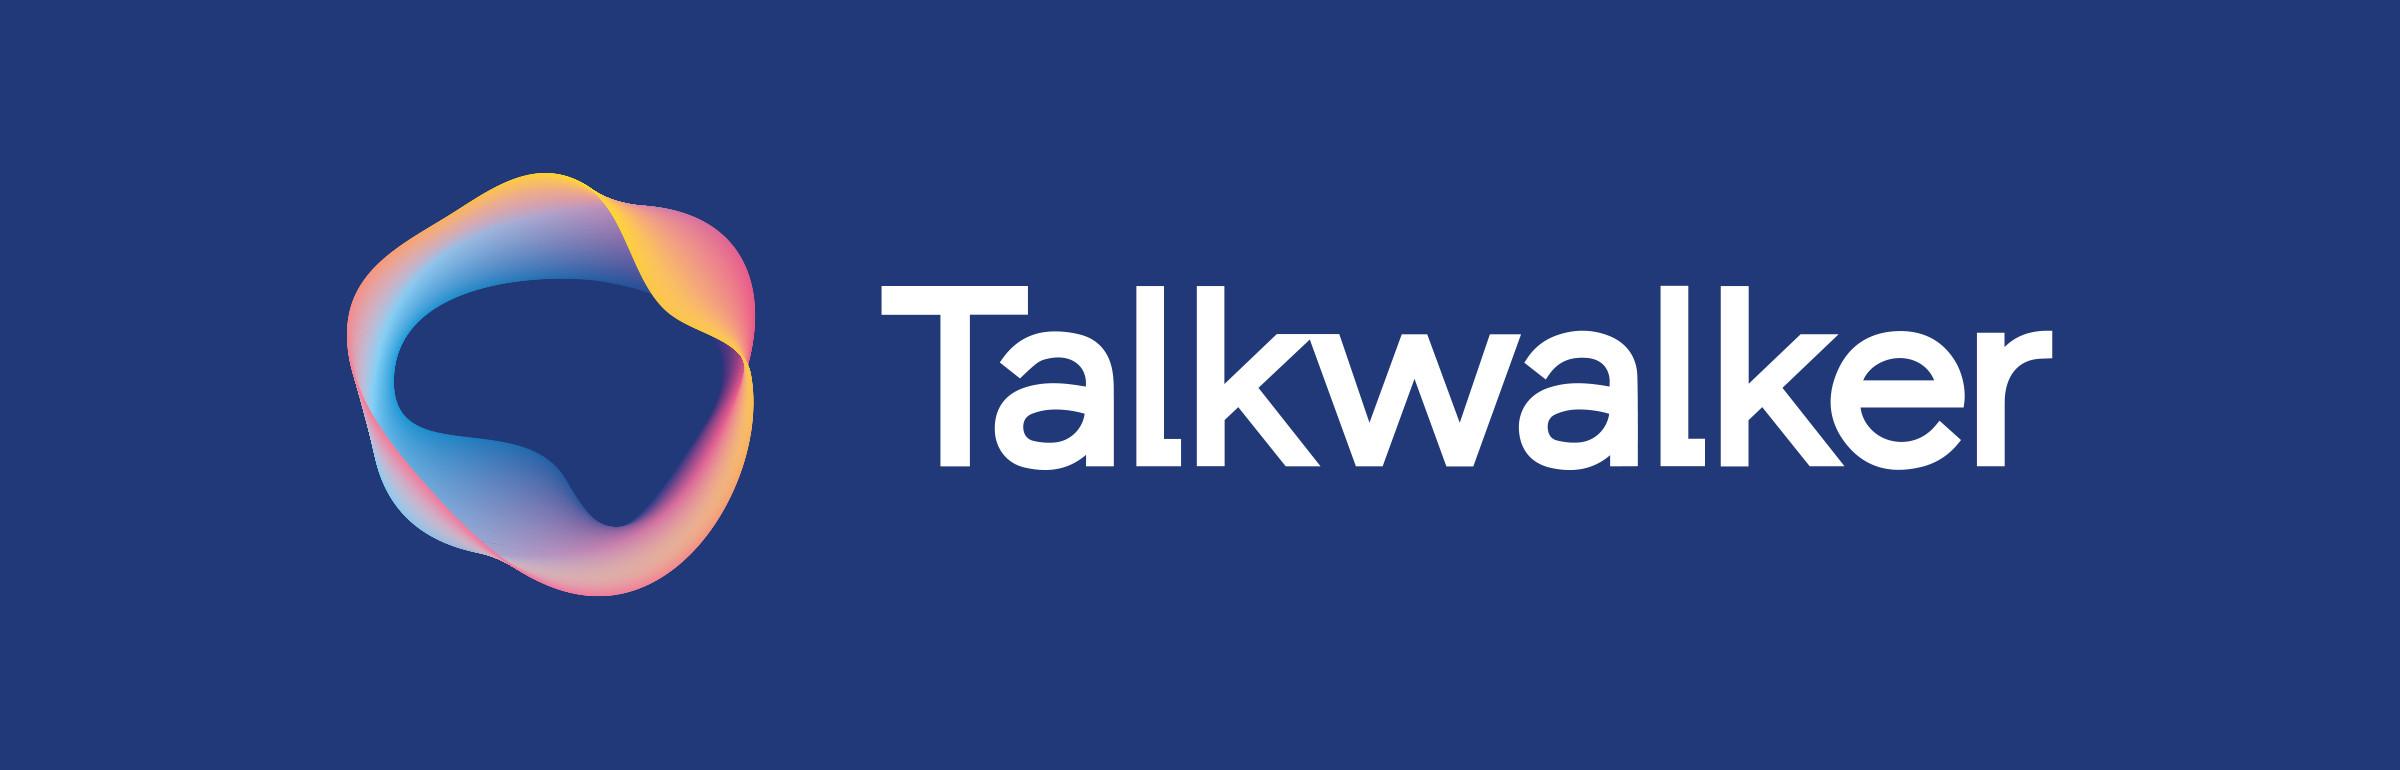 Banner Talkwalker